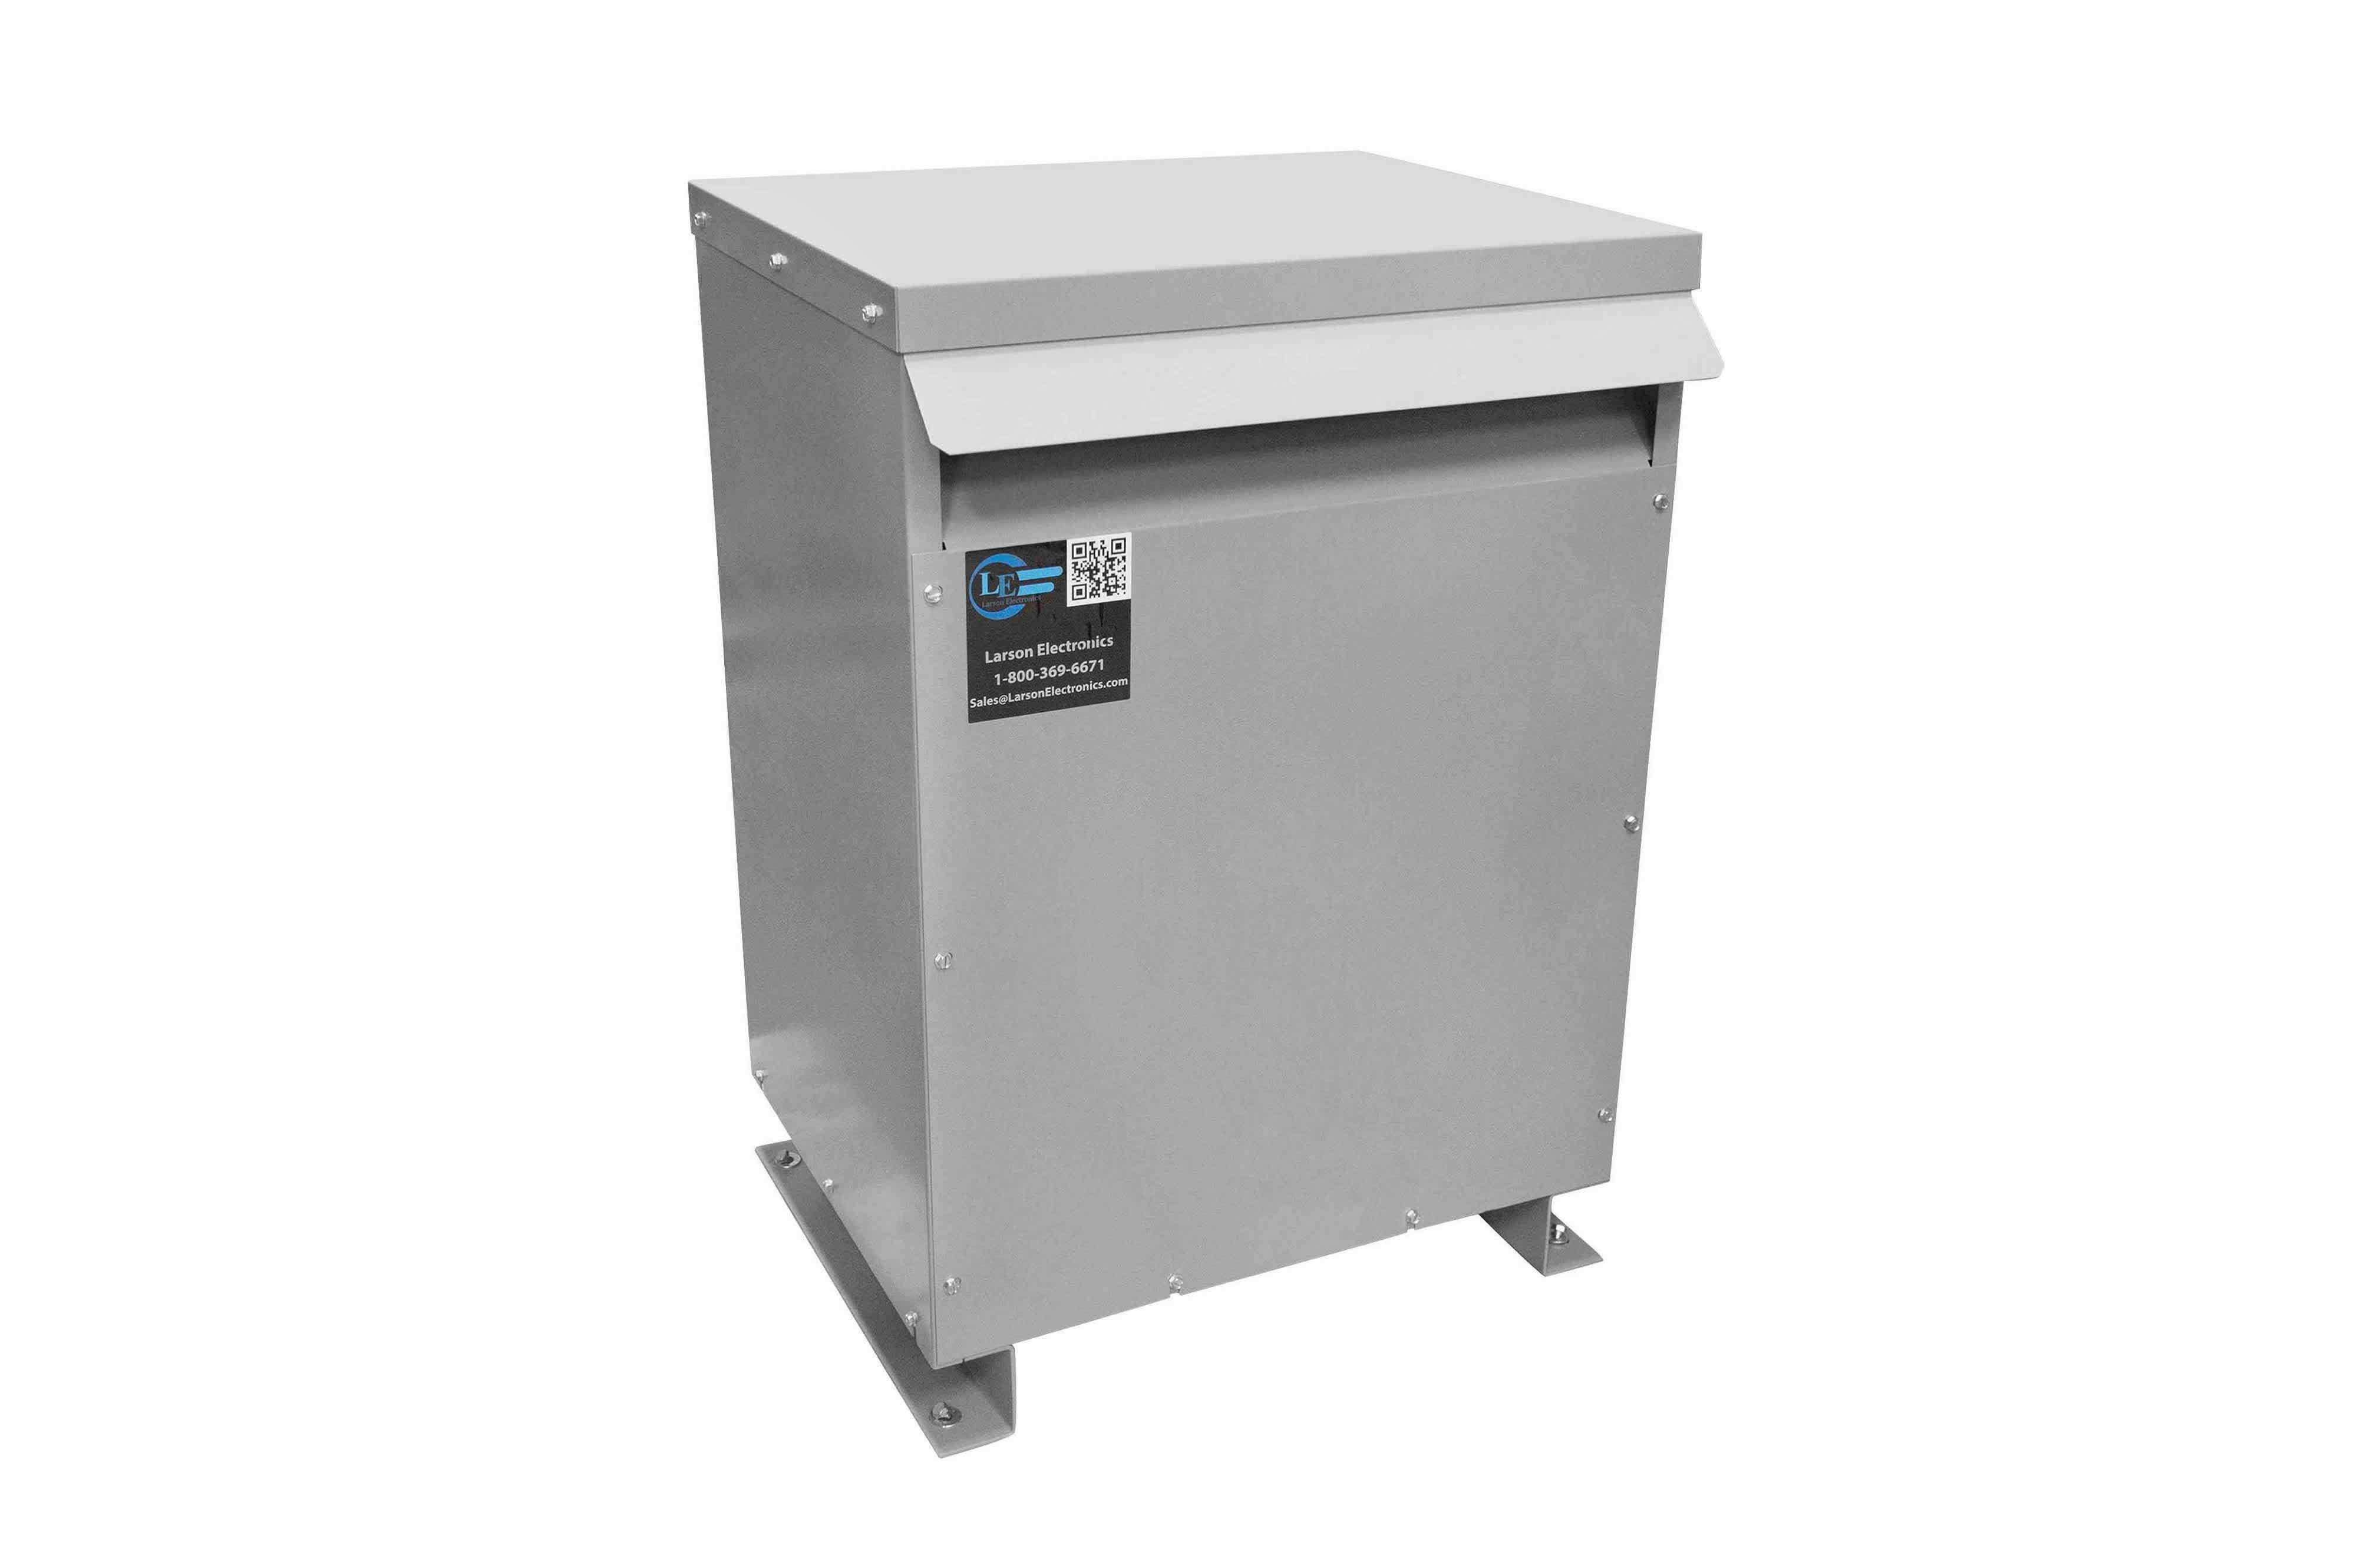 13 kVA 3PH Isolation Transformer, 480V Wye Primary, 600V Delta Secondary, N3R, Ventilated, 60 Hz